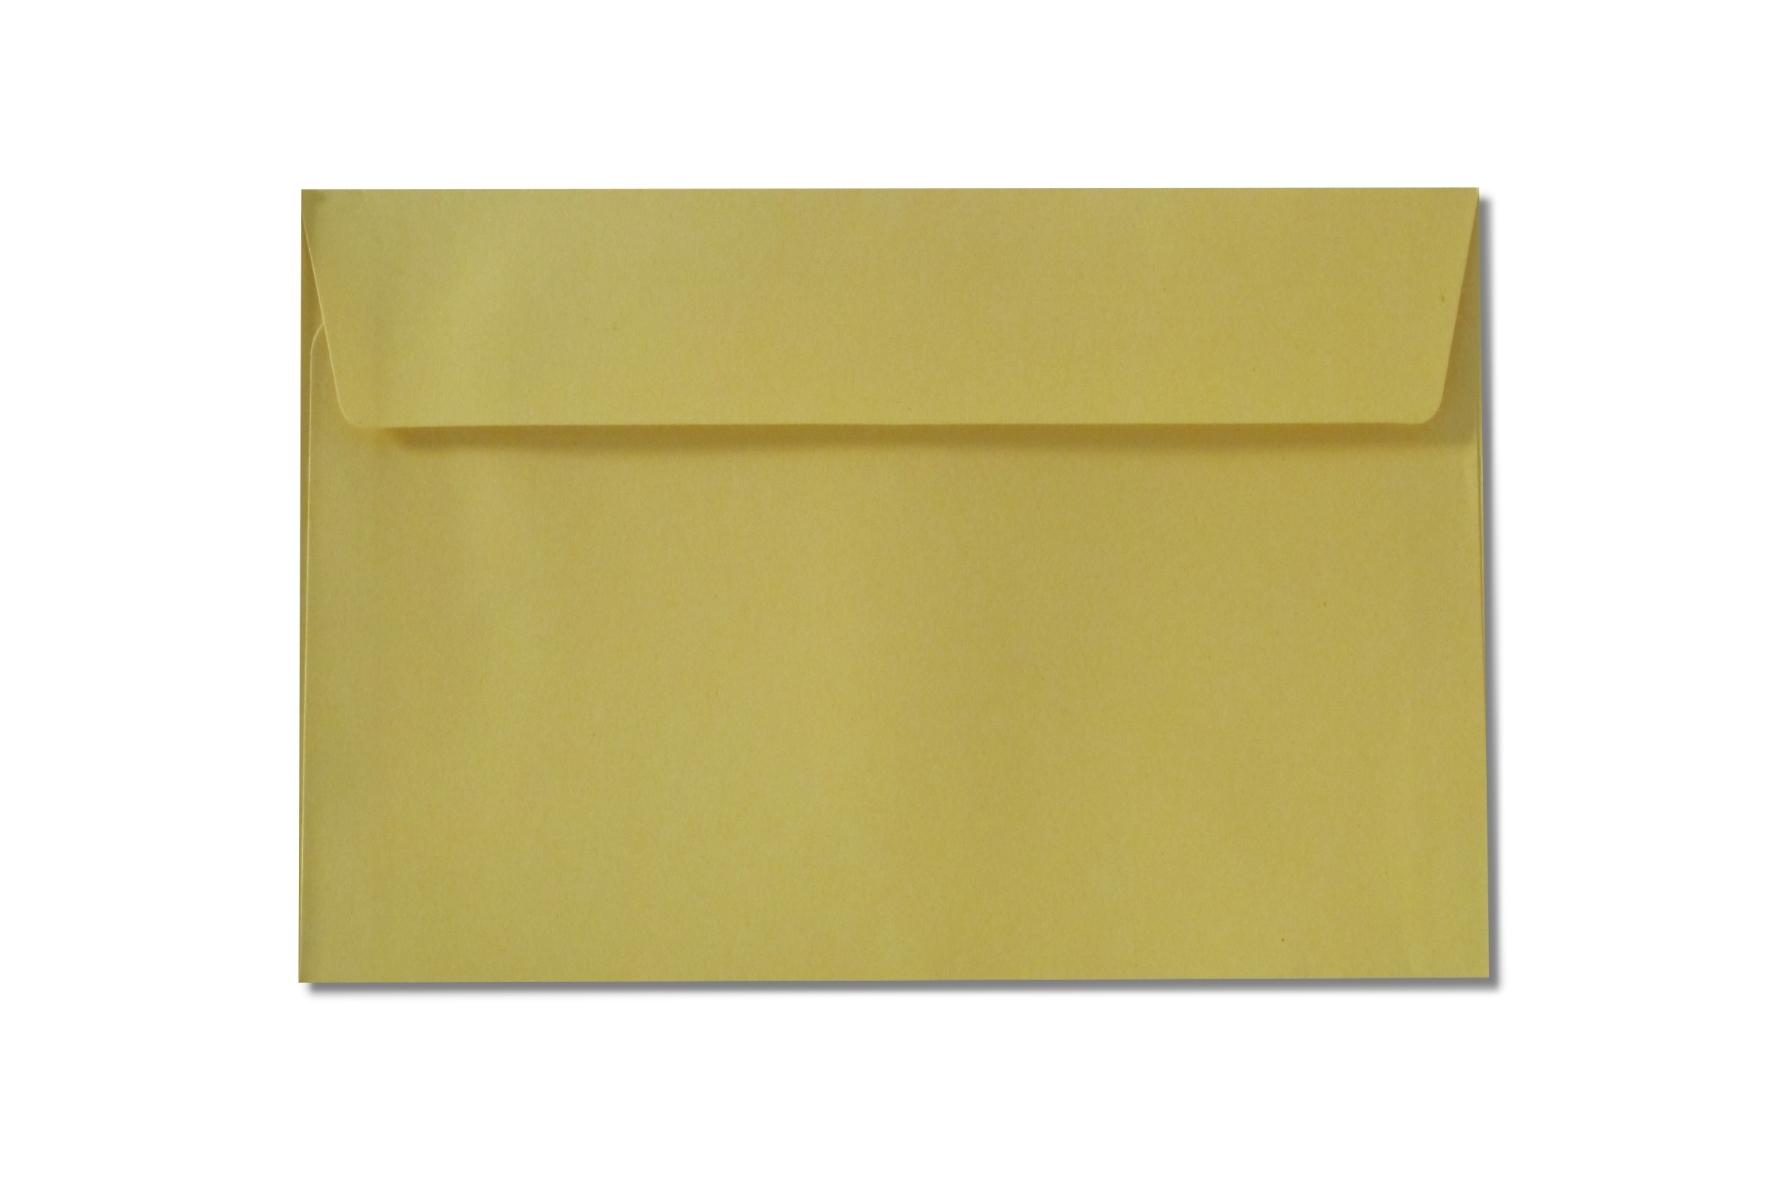 c6 yellow envelopes